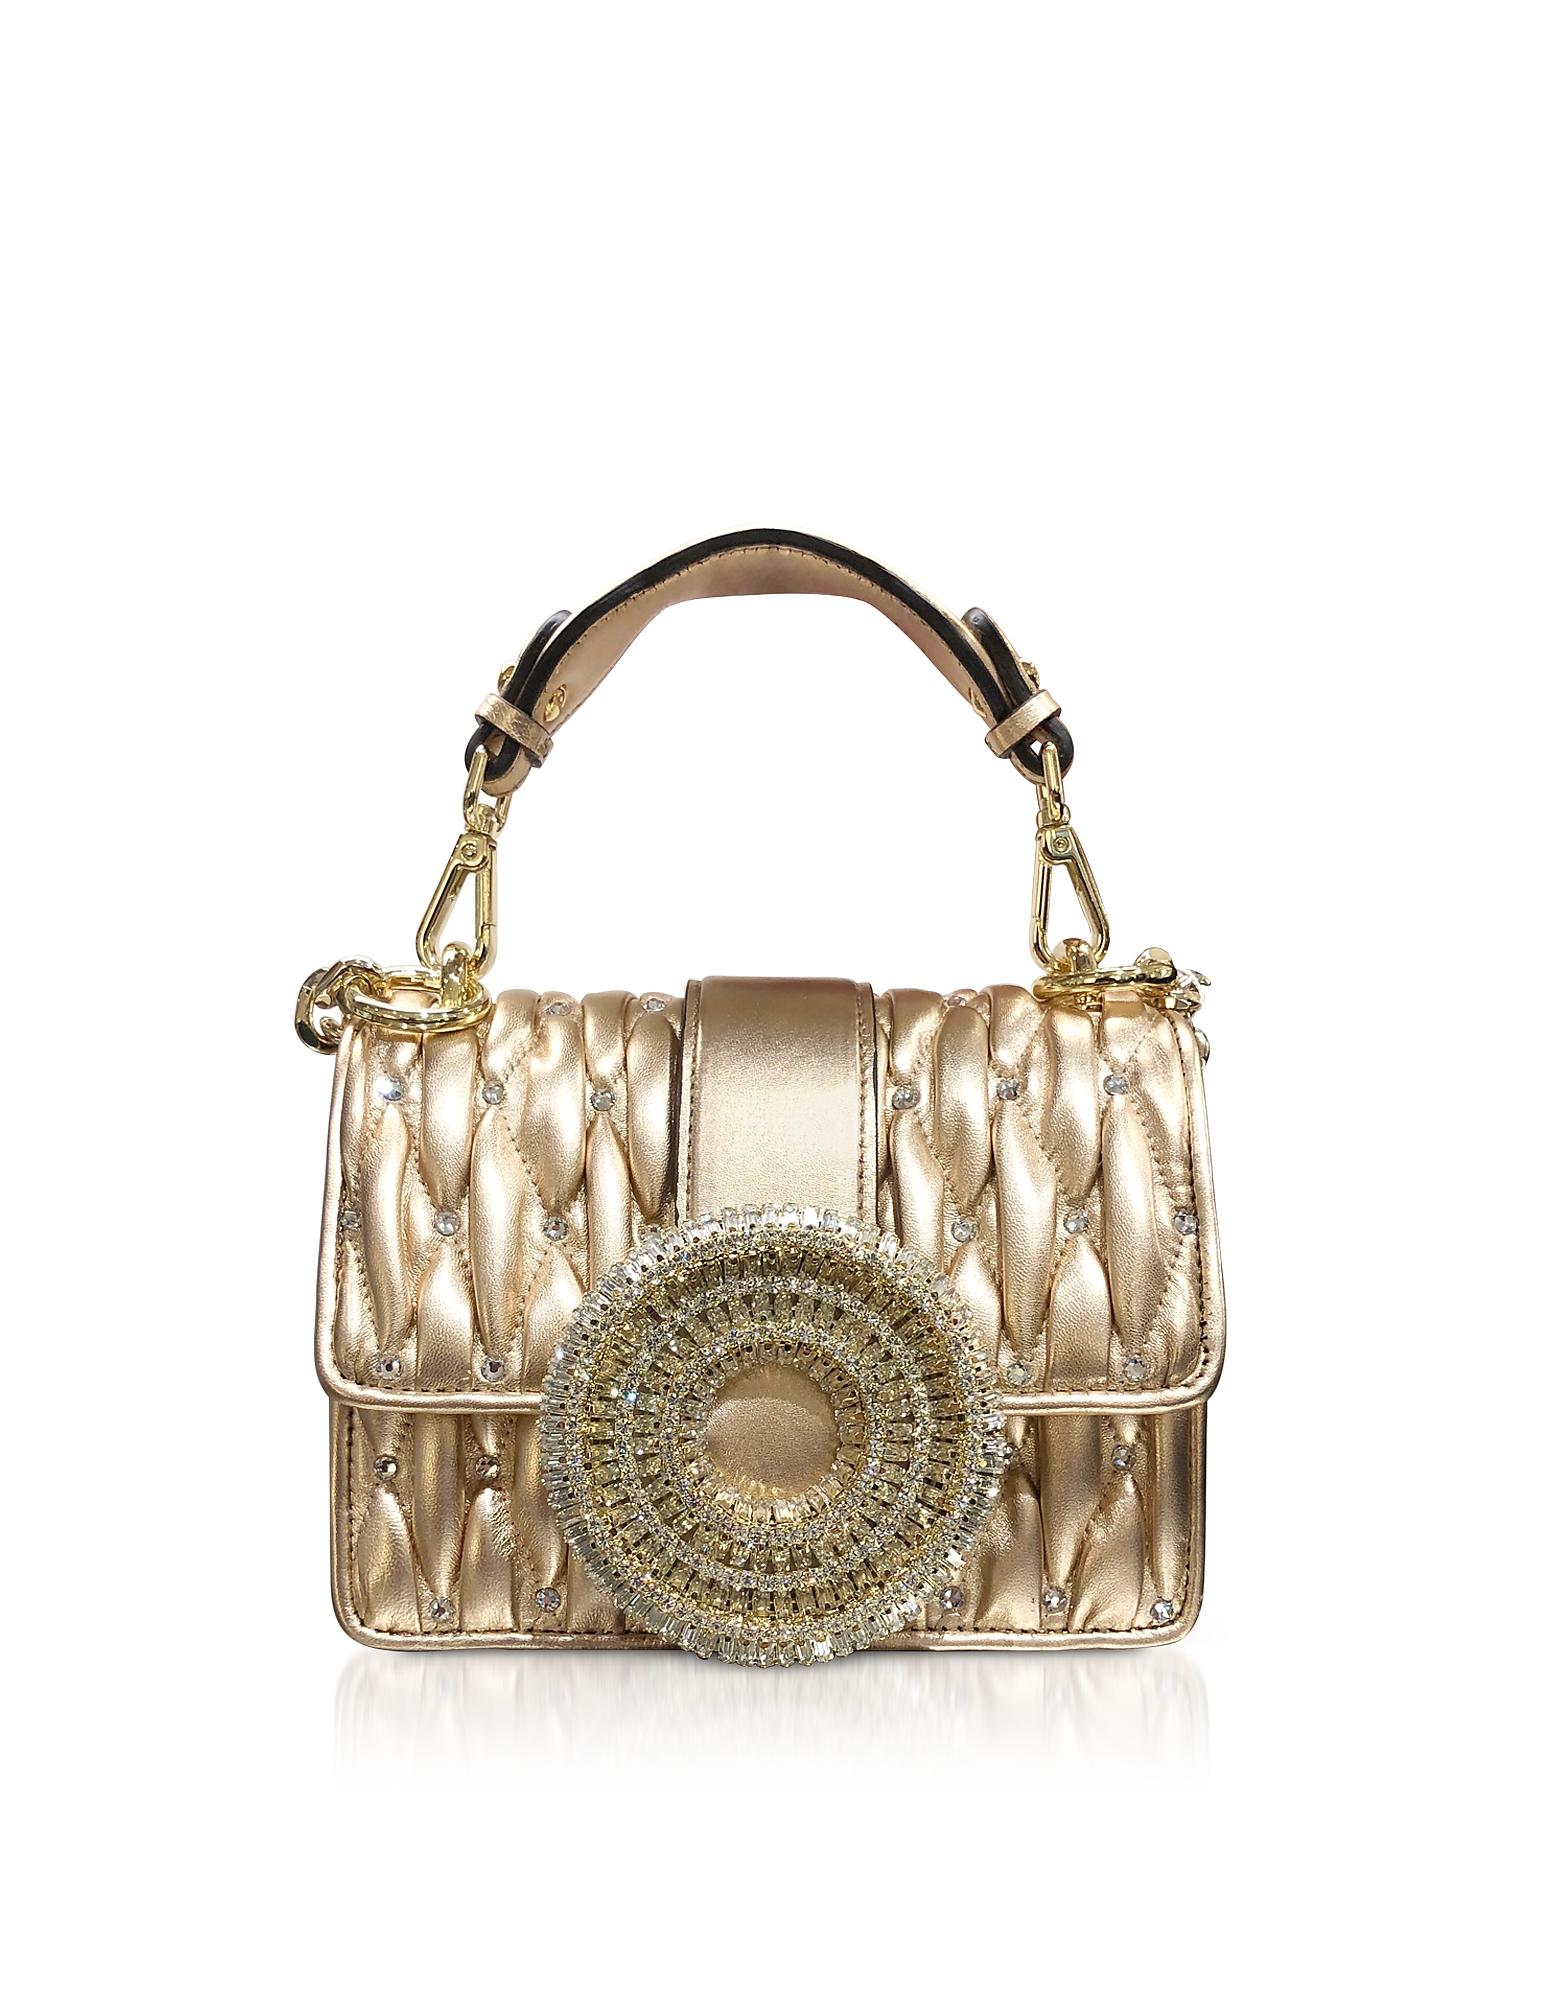 Gio Small Rose Gold Leather & Crystal Handbag